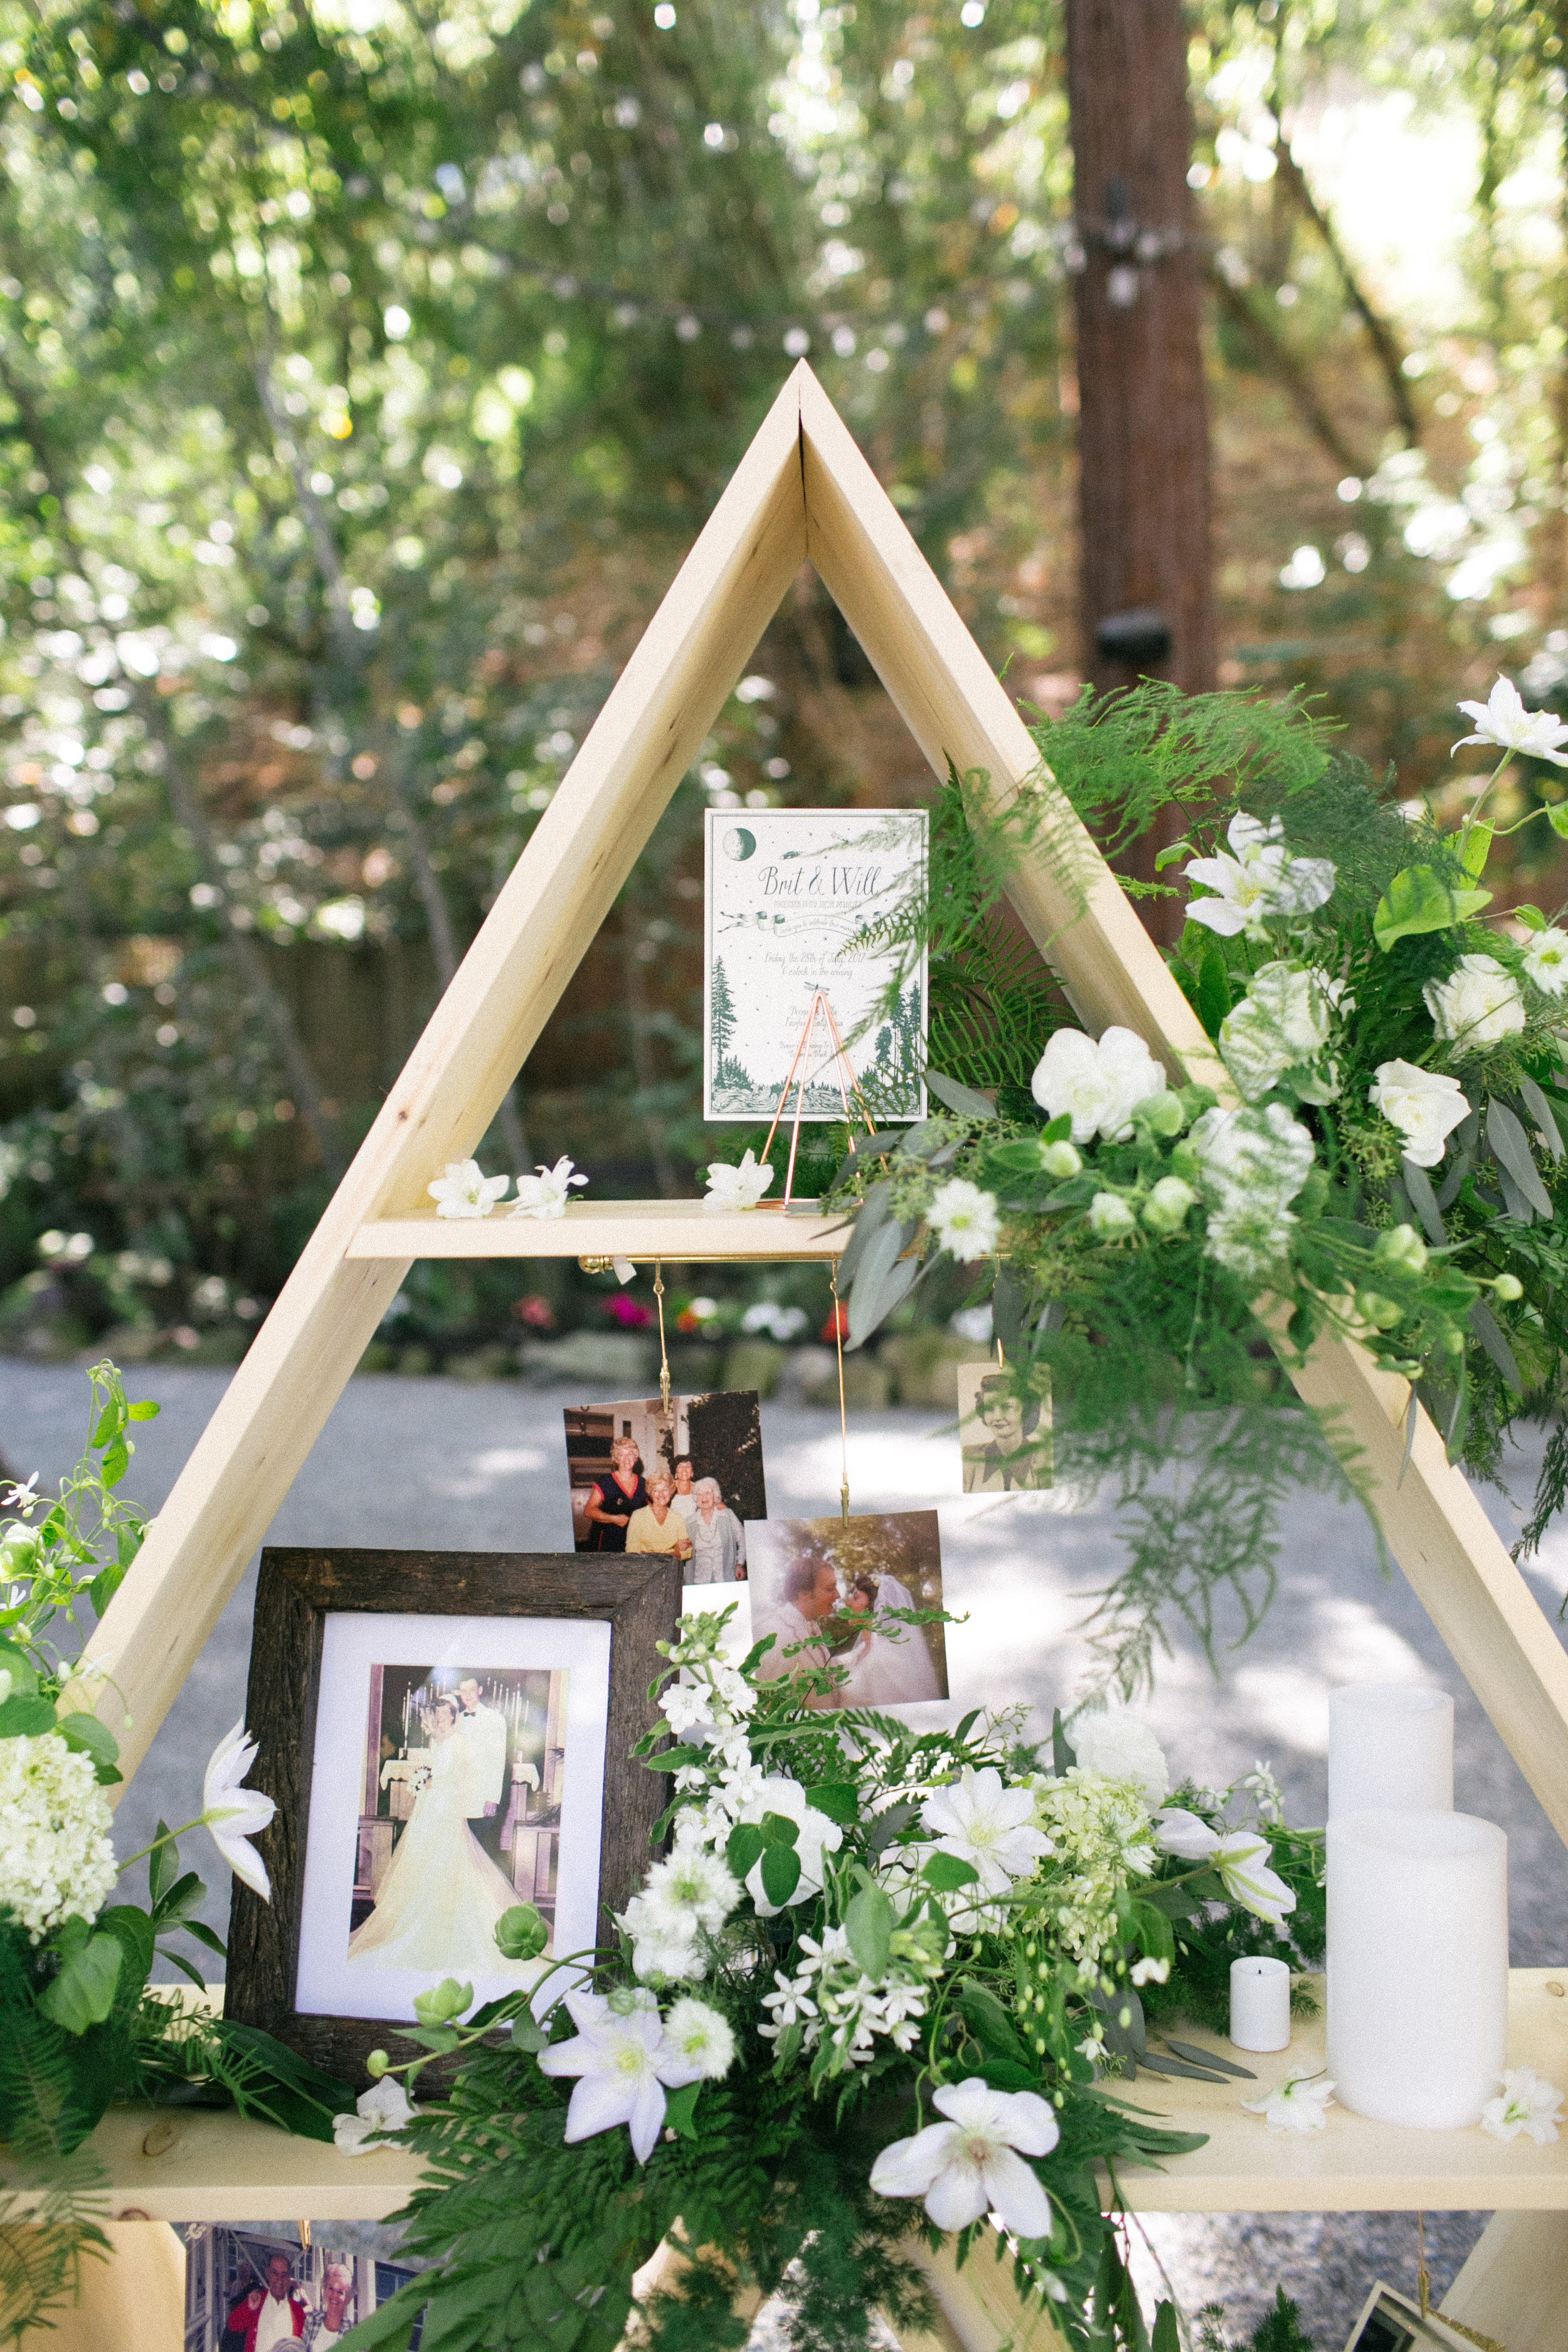 Family Photo Display Ideas for Weddings - Nichols Photographers